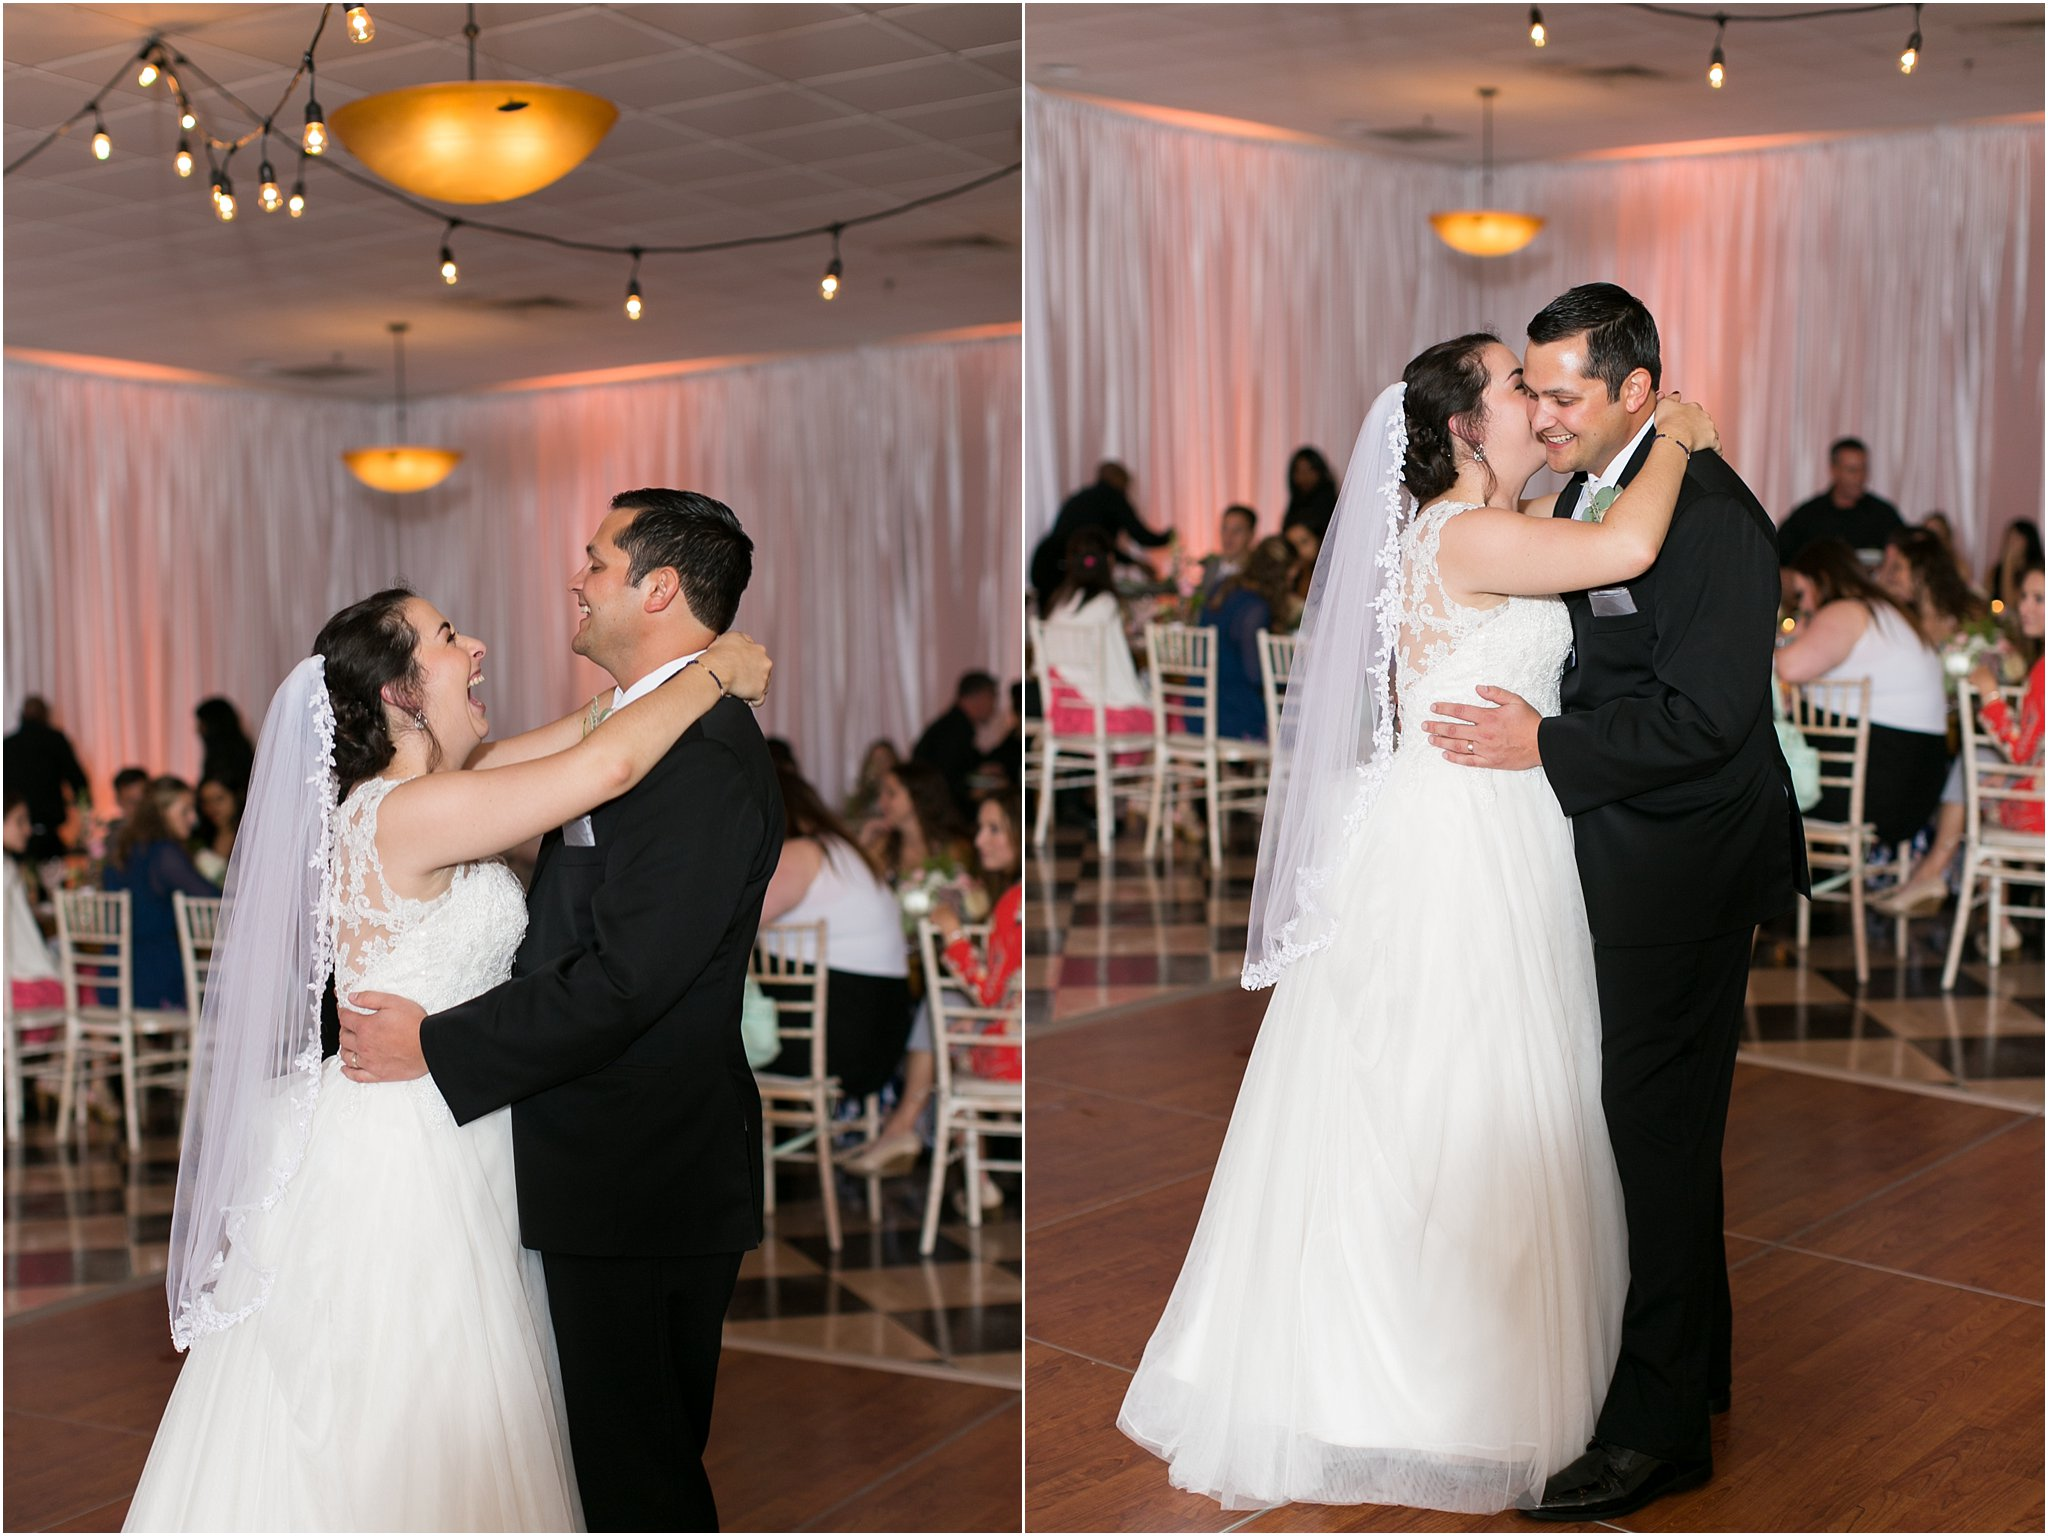 jessica_ryan_photography_virginia_wedding_photographer_wedding_hurricane_norfolk_botanical_gardens_hurricane_matthew_wedding_3629